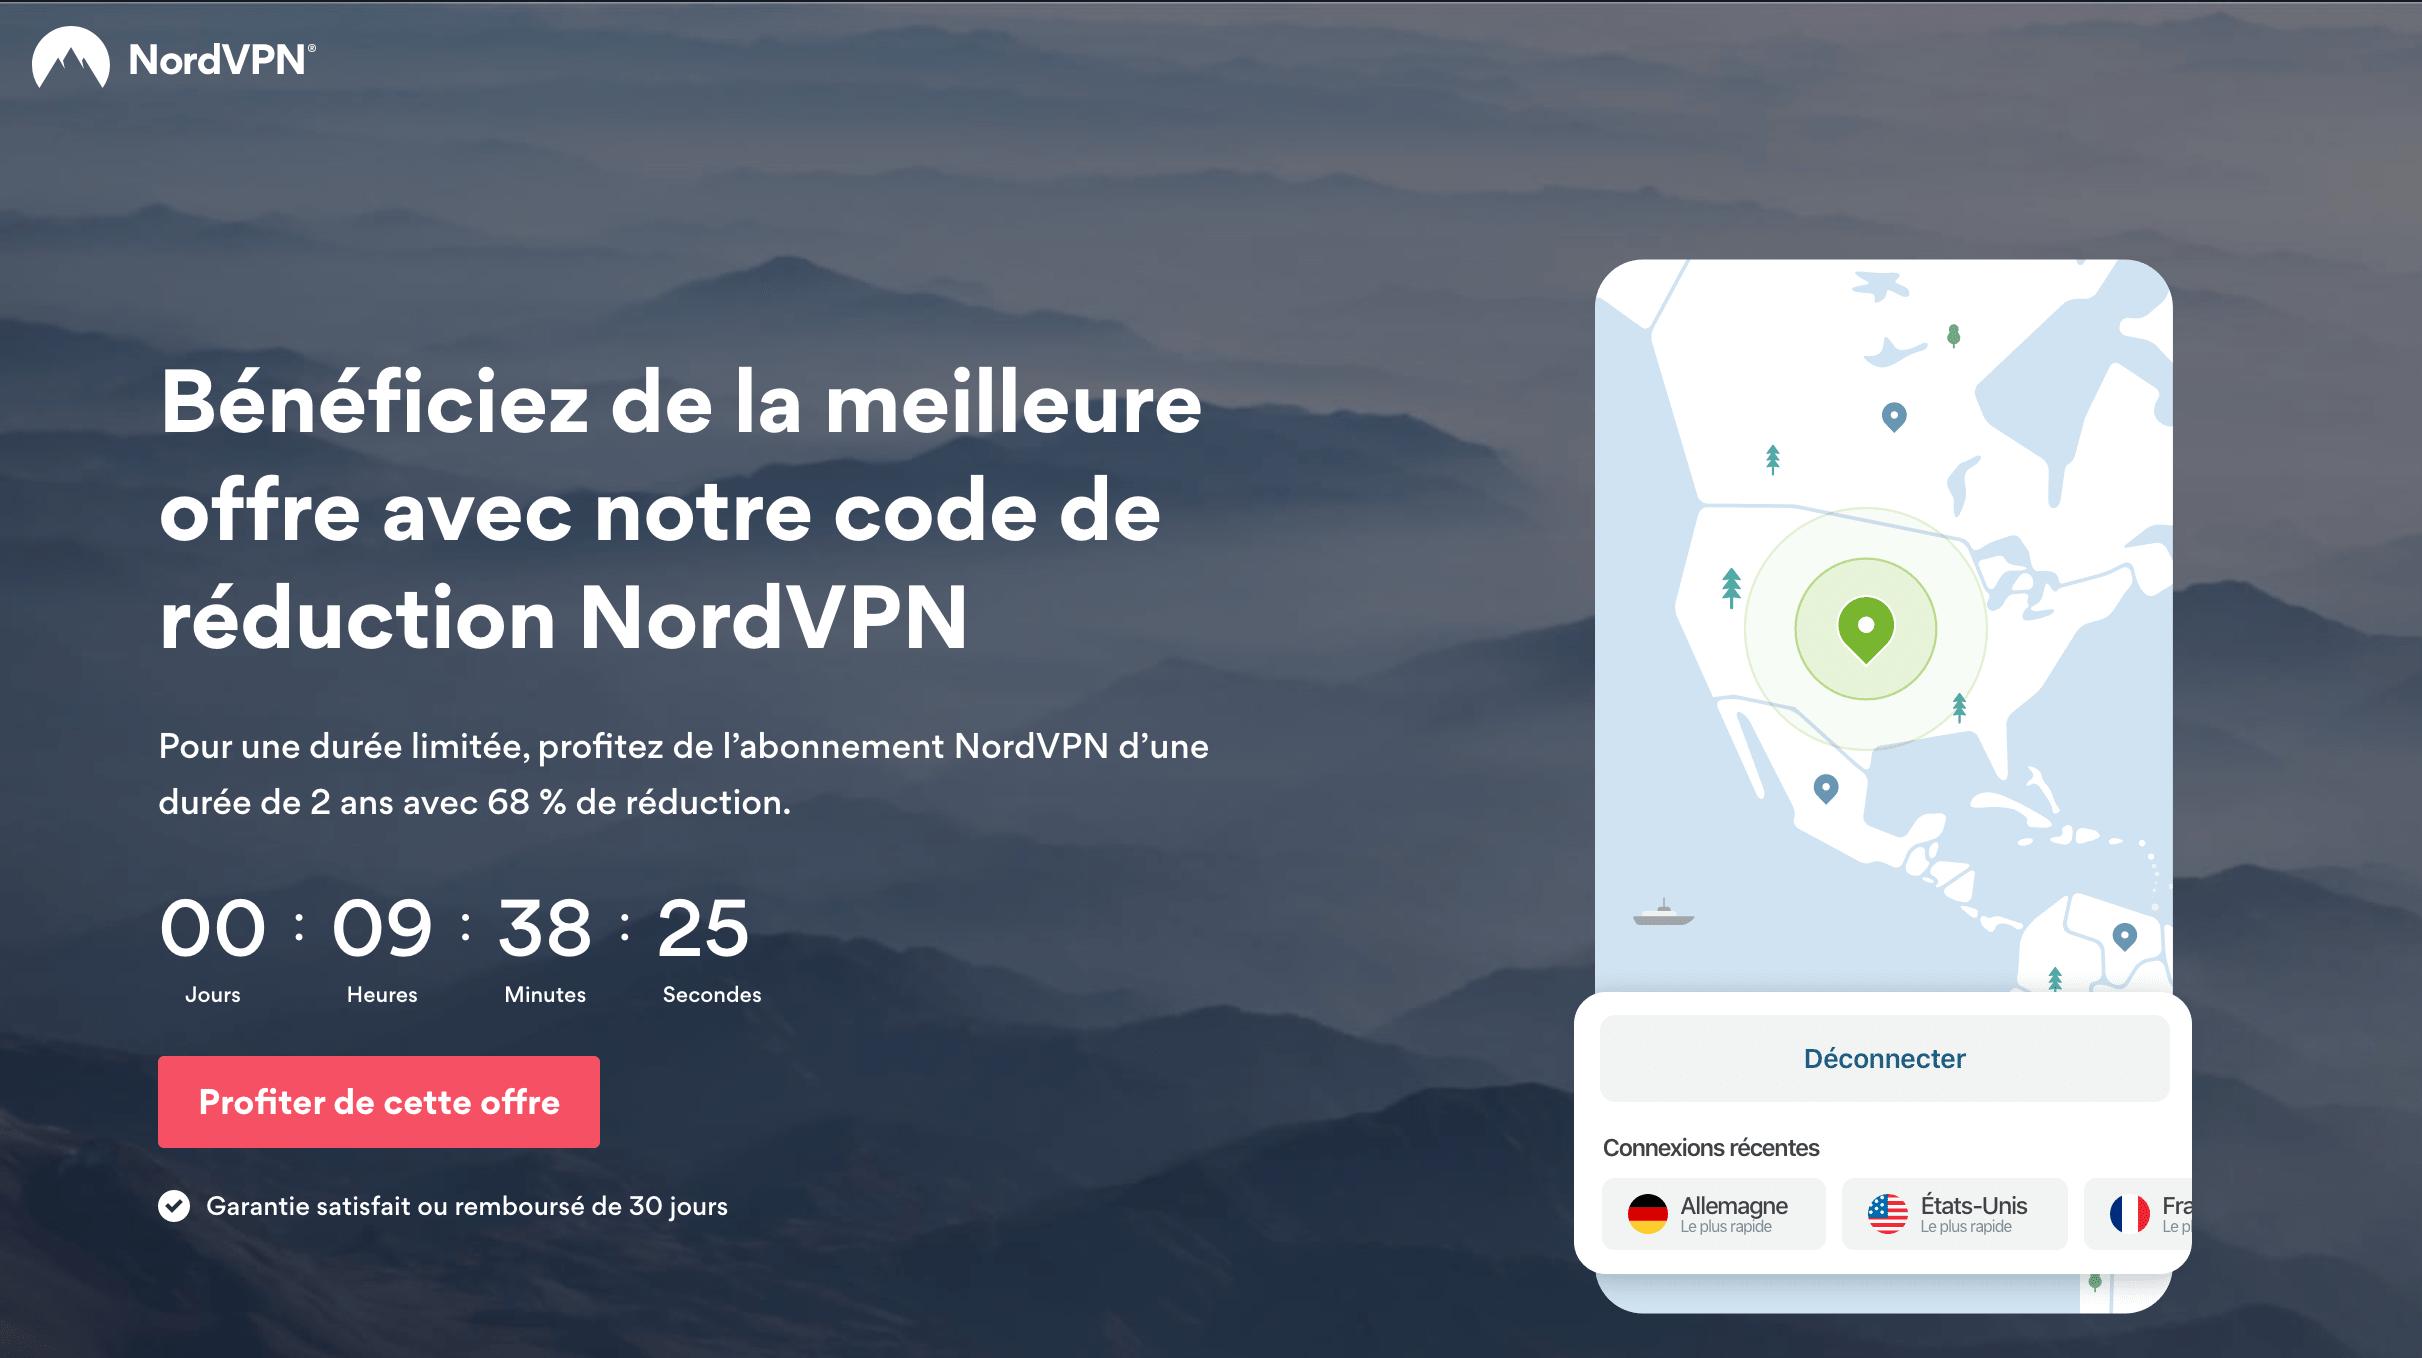 NordVPN à -68% avec le code promo tipsfromgeeks